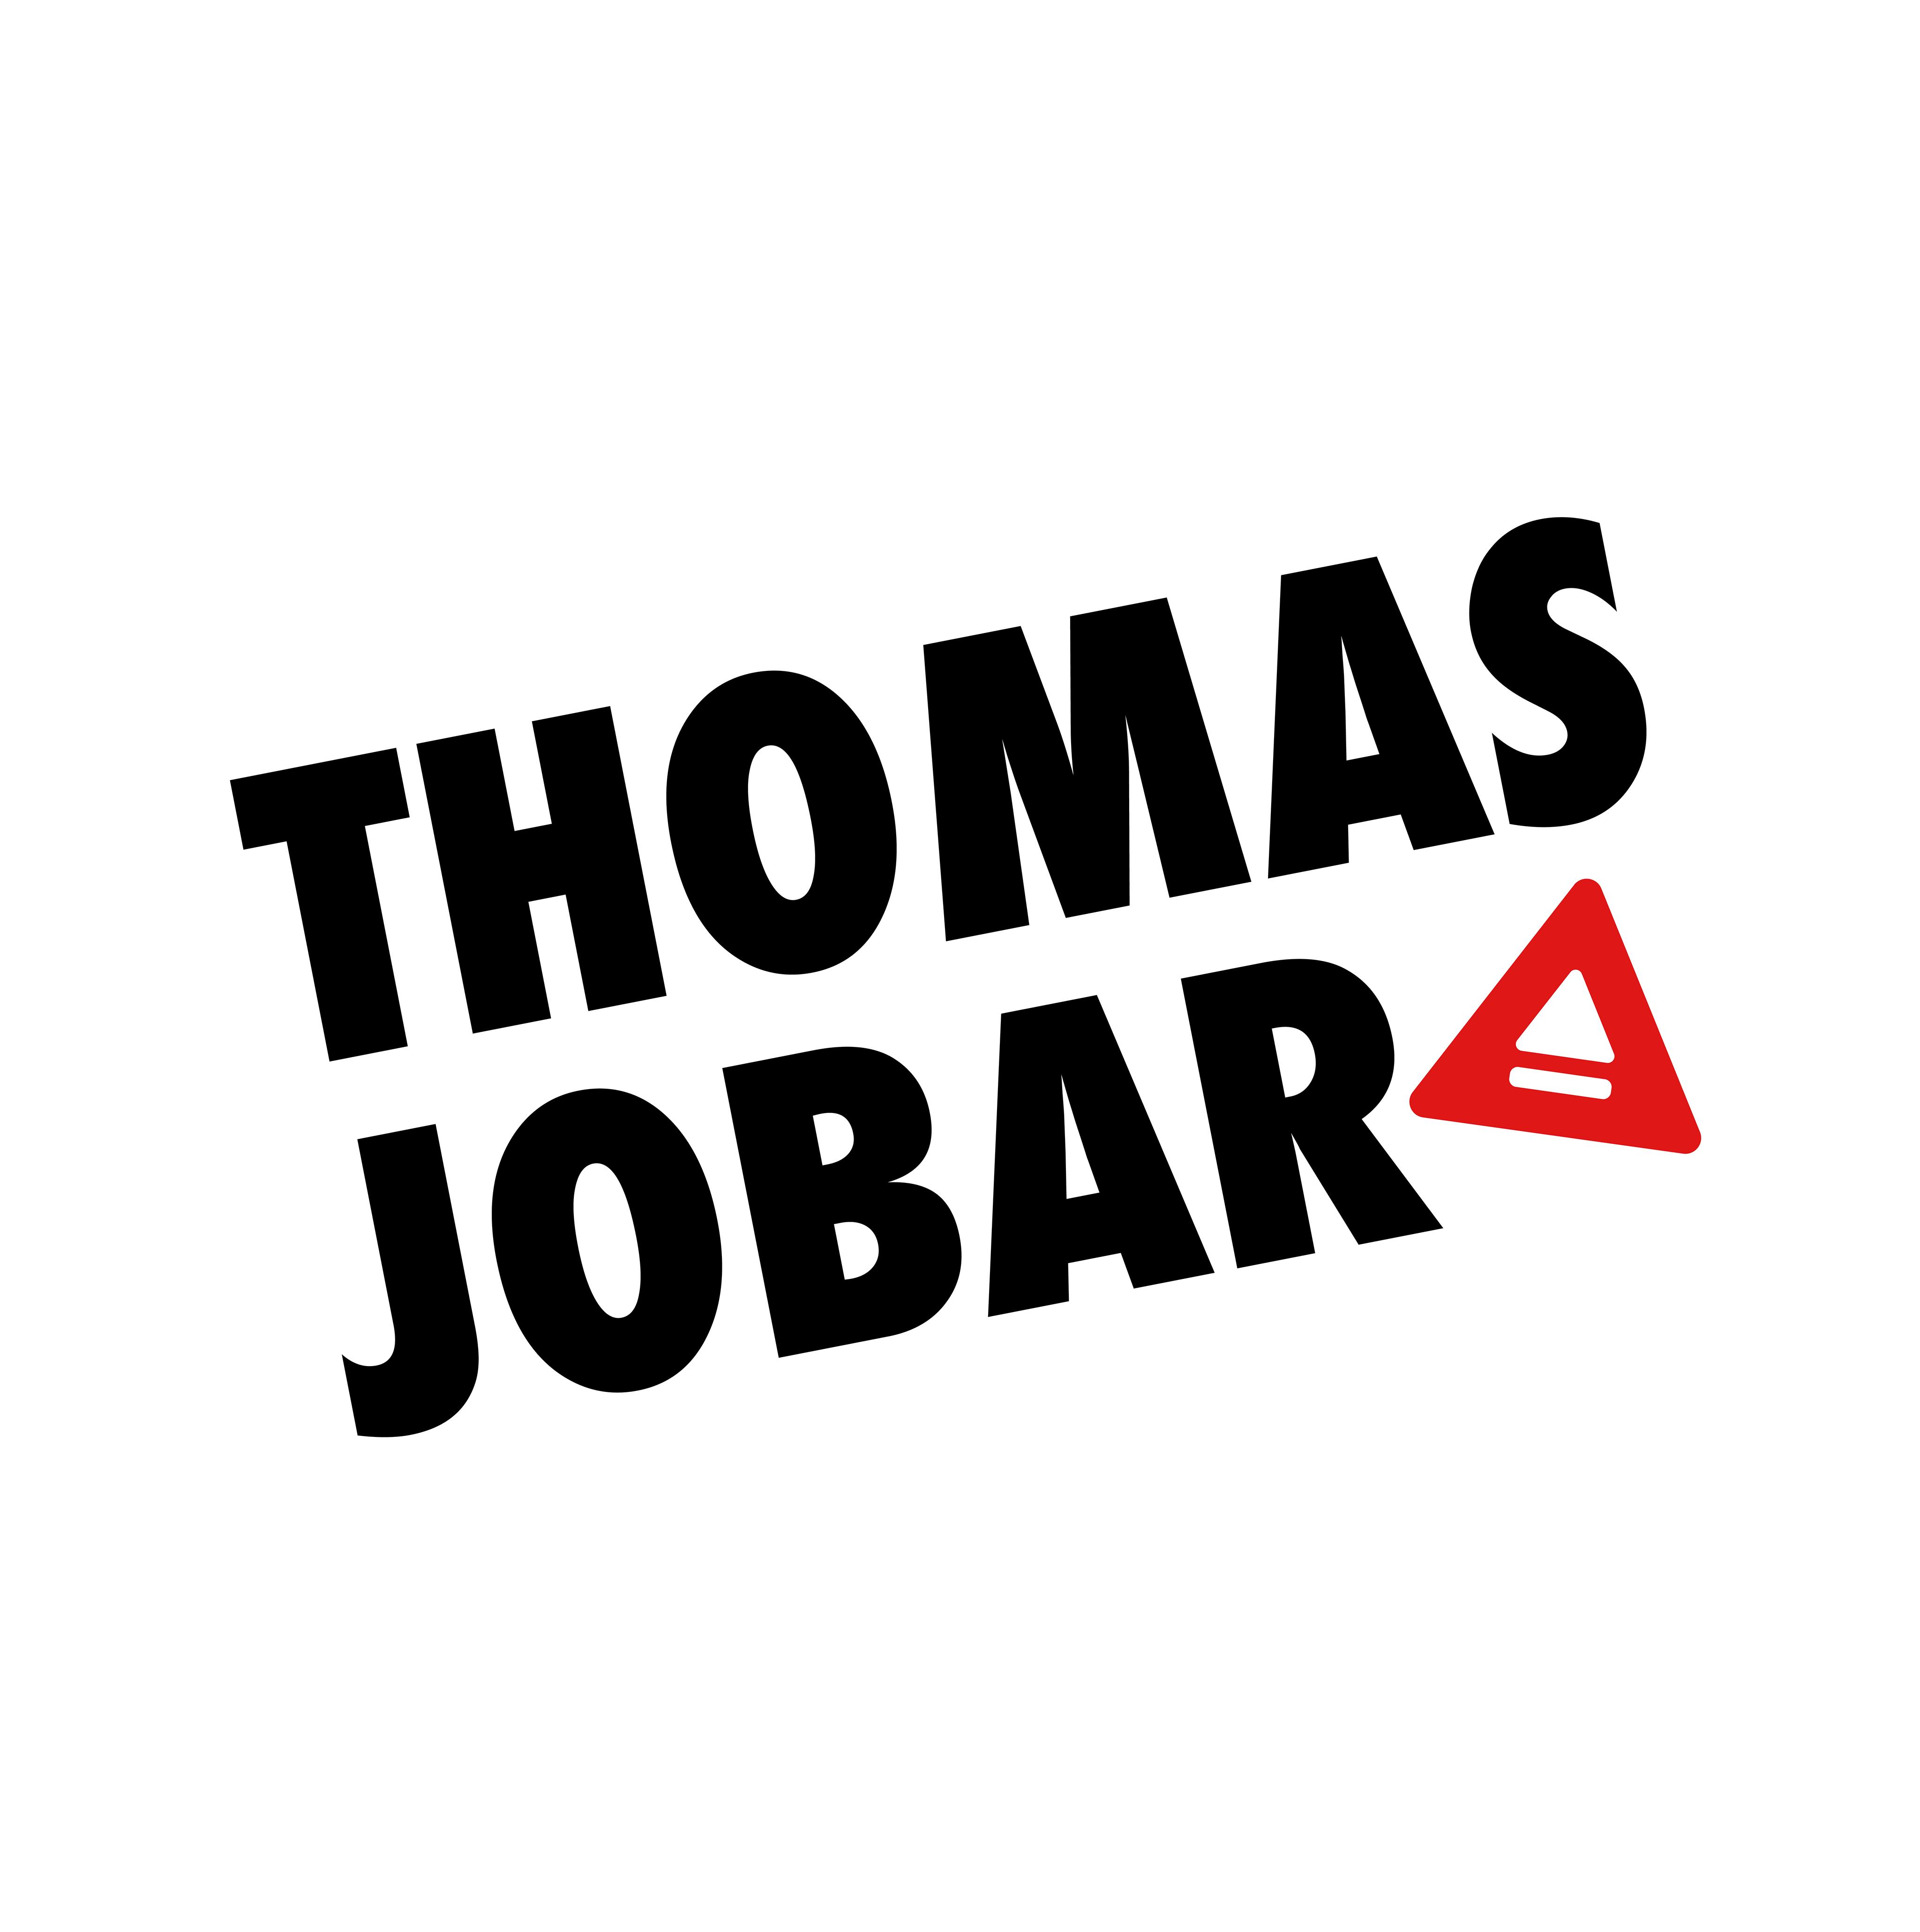 jobard thomas